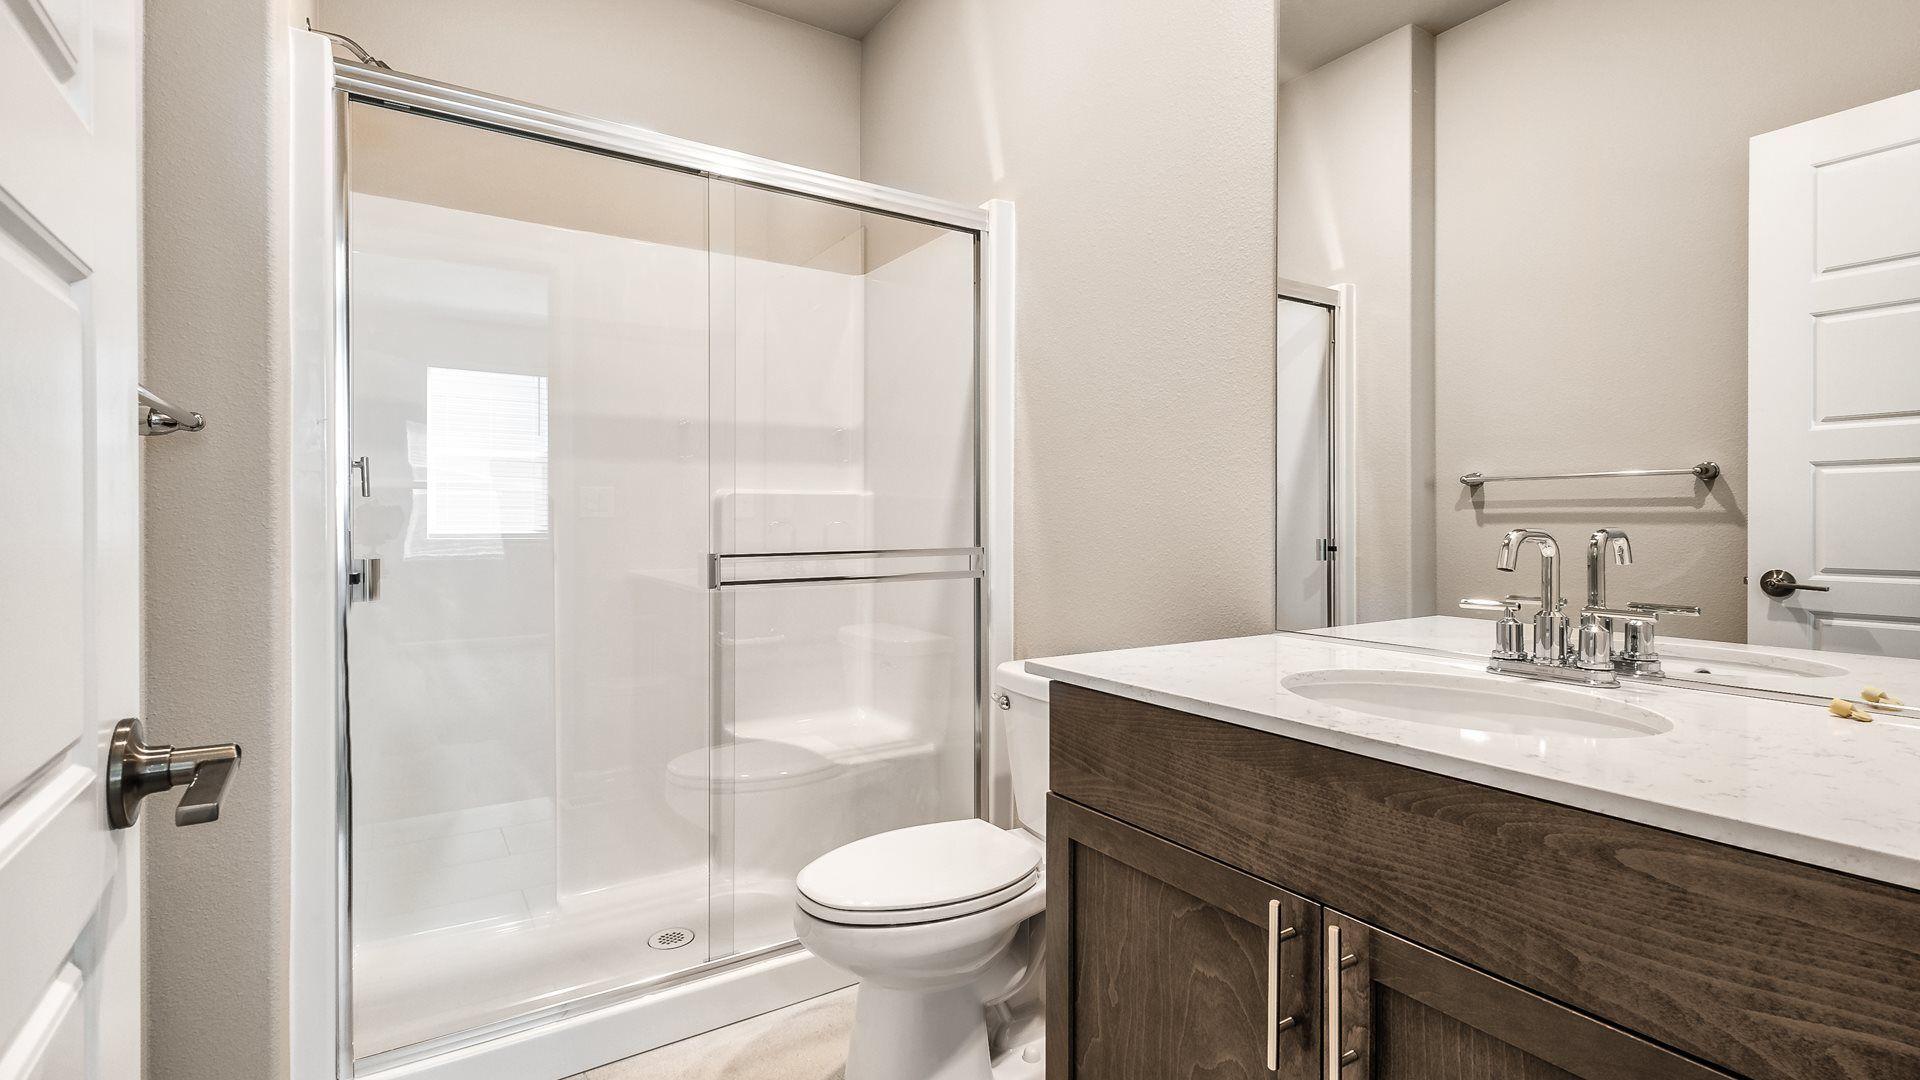 Bathroom featured in the Westport, Village By Lennar in Seattle-Bellevue, WA